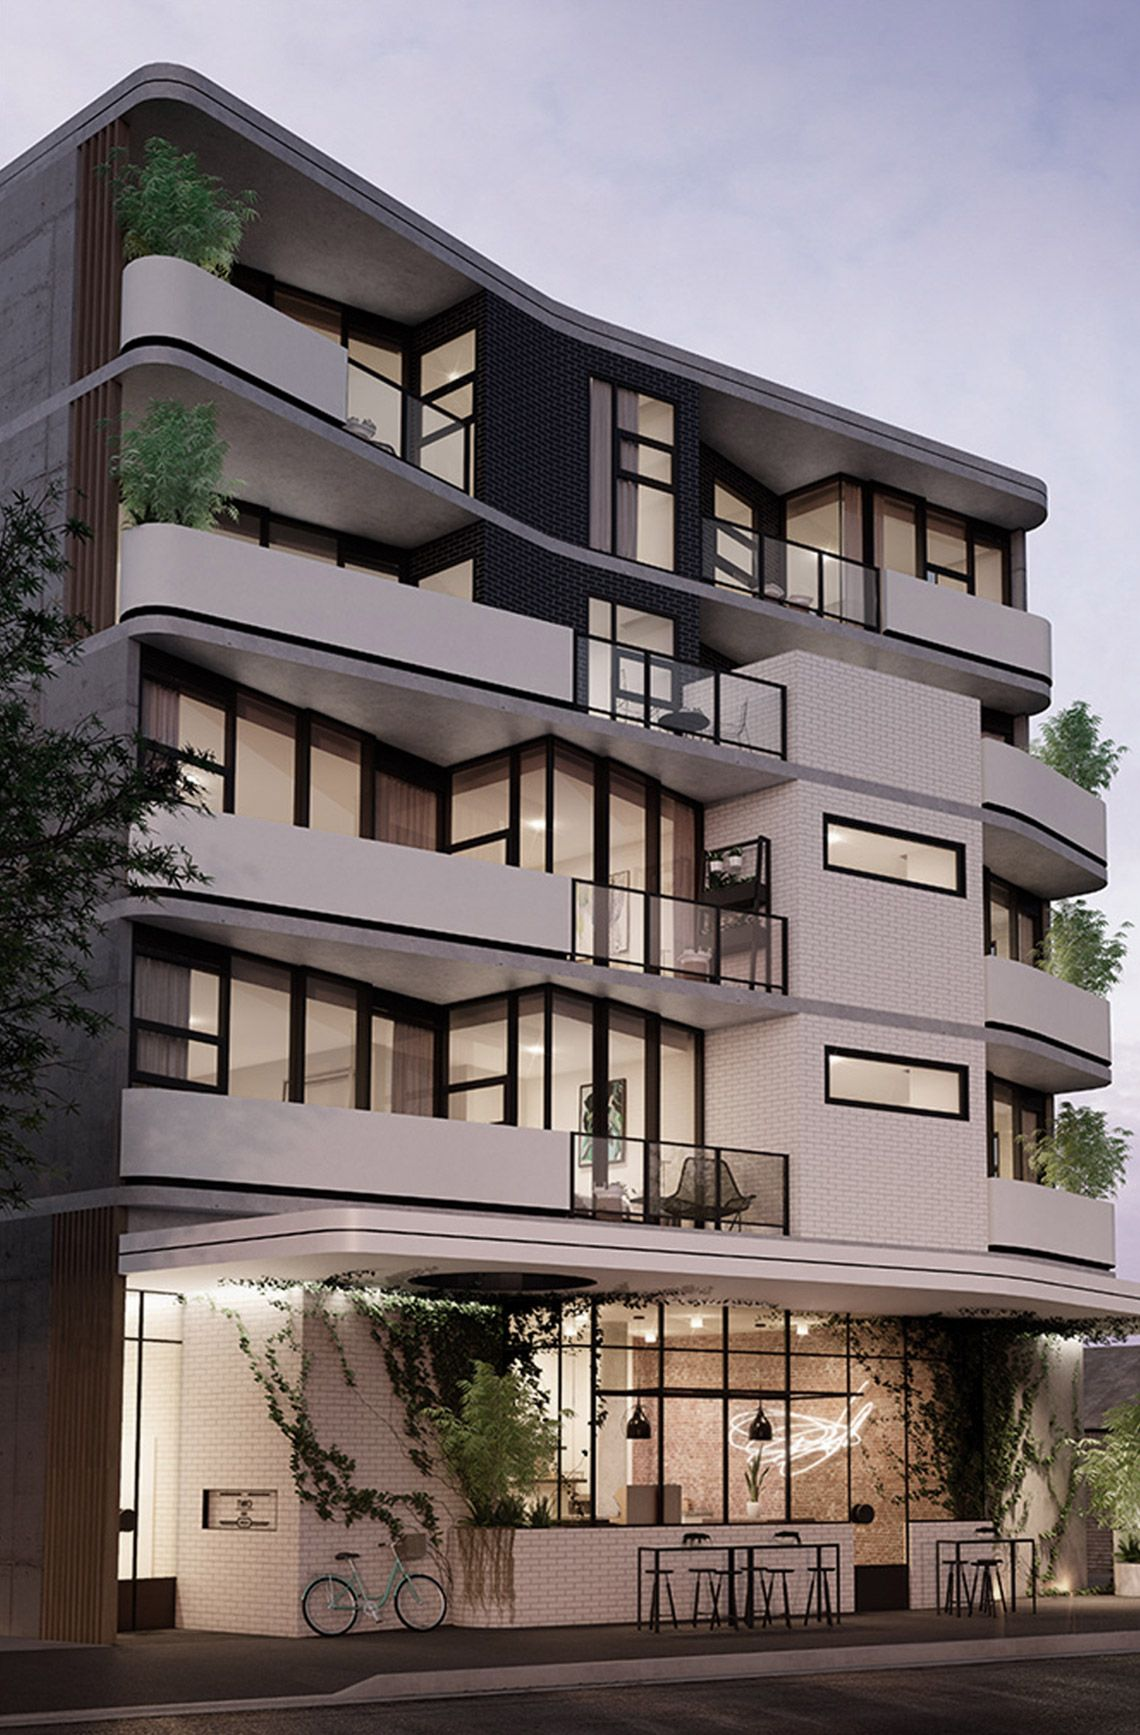 Kestie Lane Studio Morton Avenue Inzynier Pinterest Architecture Building I Facade